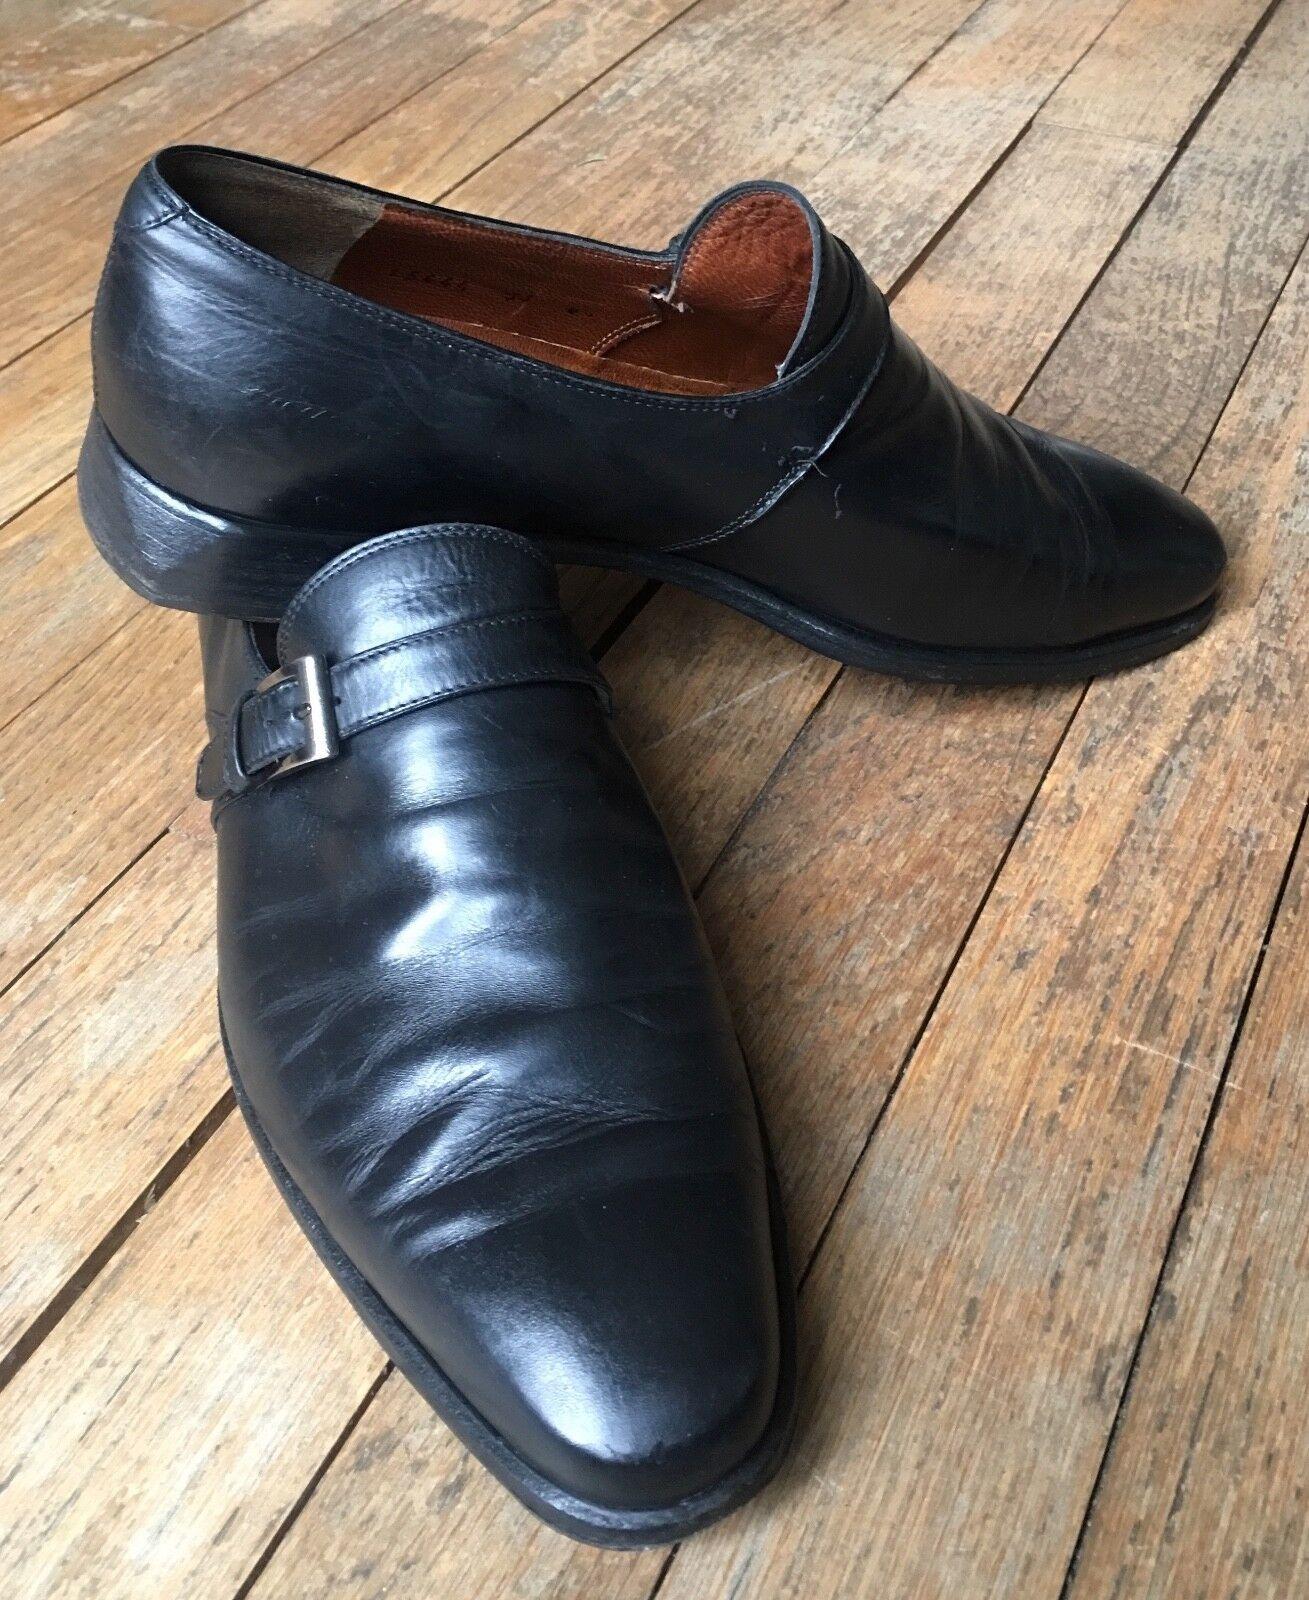 shoes Fratelli Rossetti à boucle size 6,5   40 - black